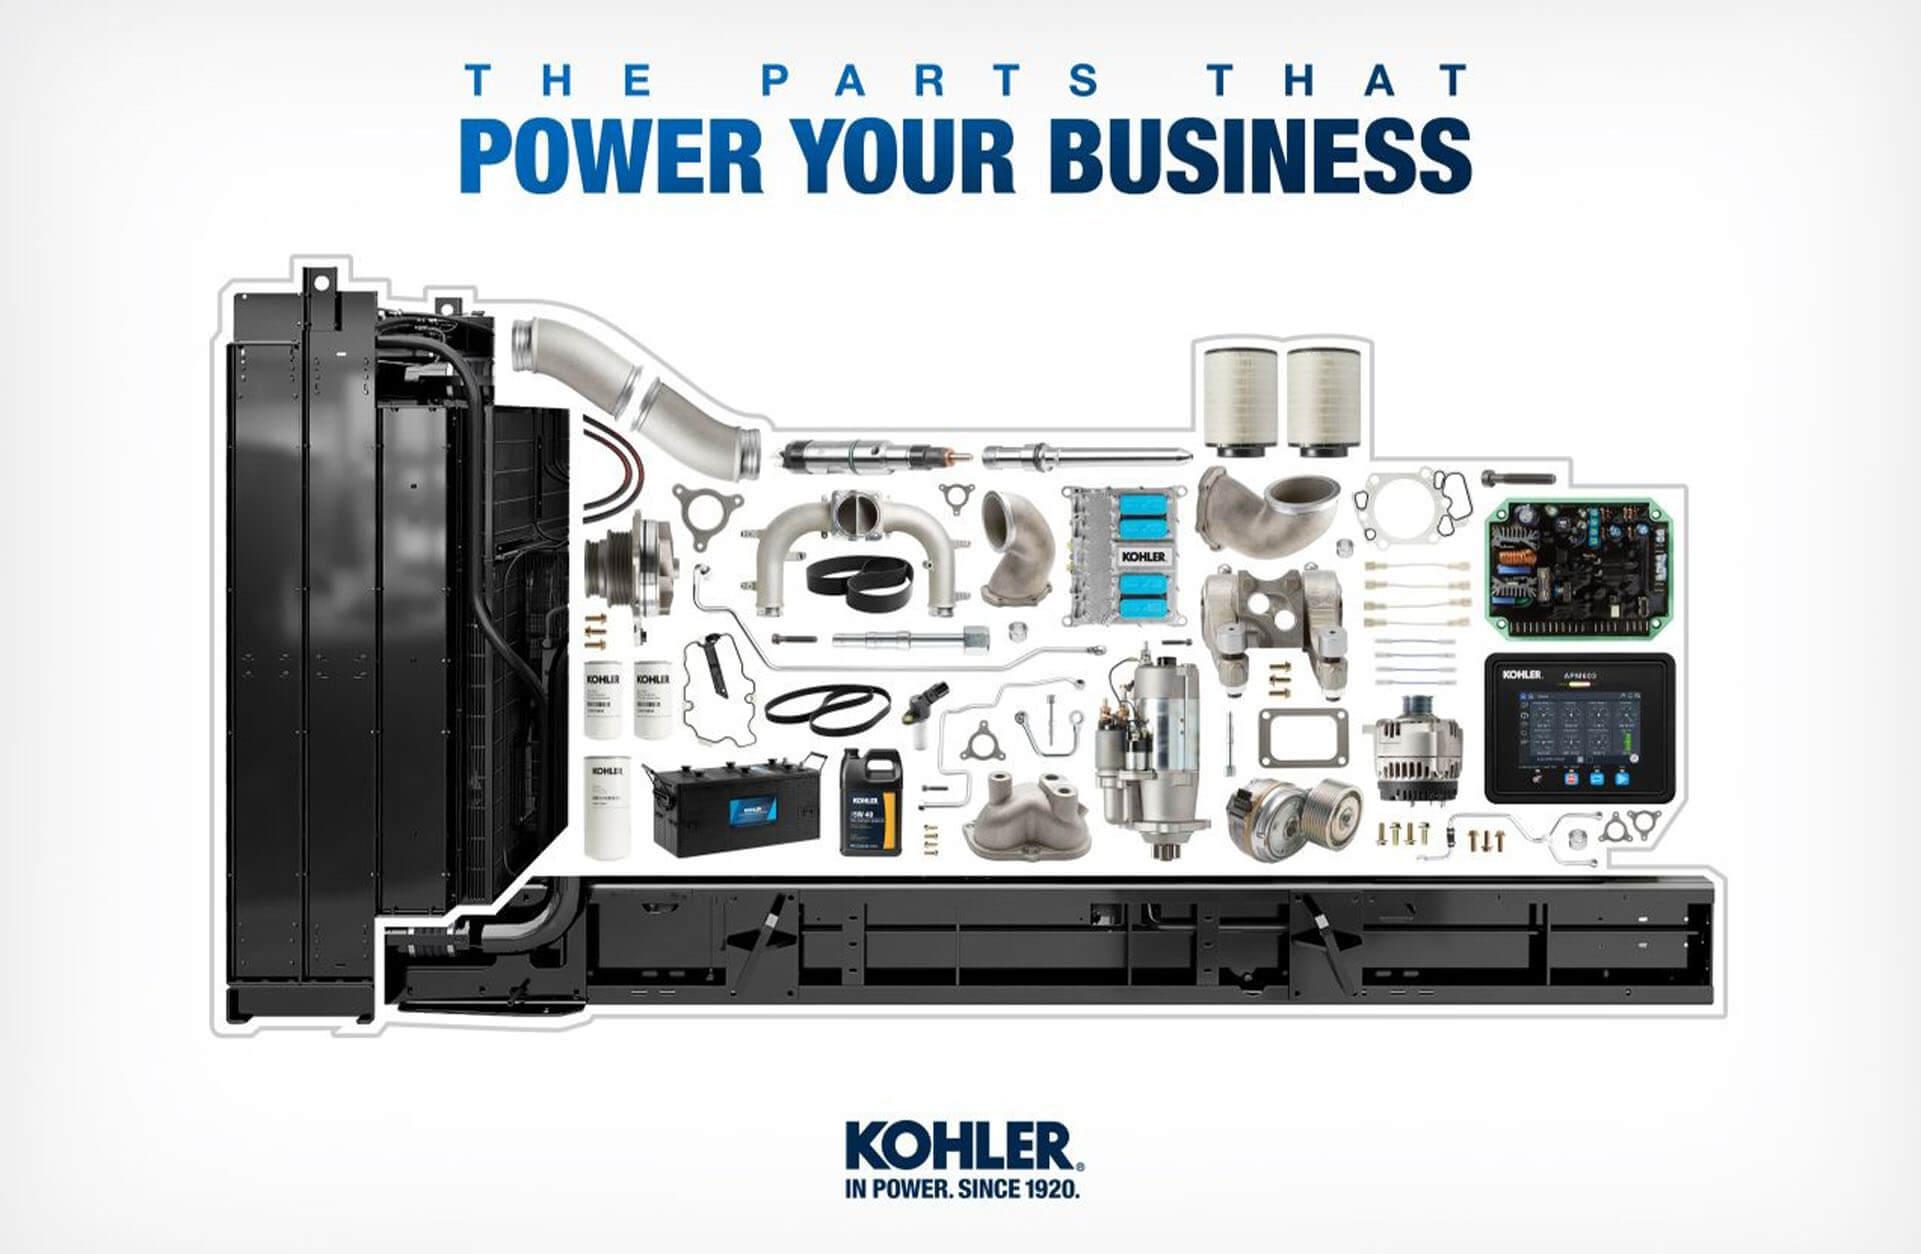 Kohler-SDMO Spare Parts